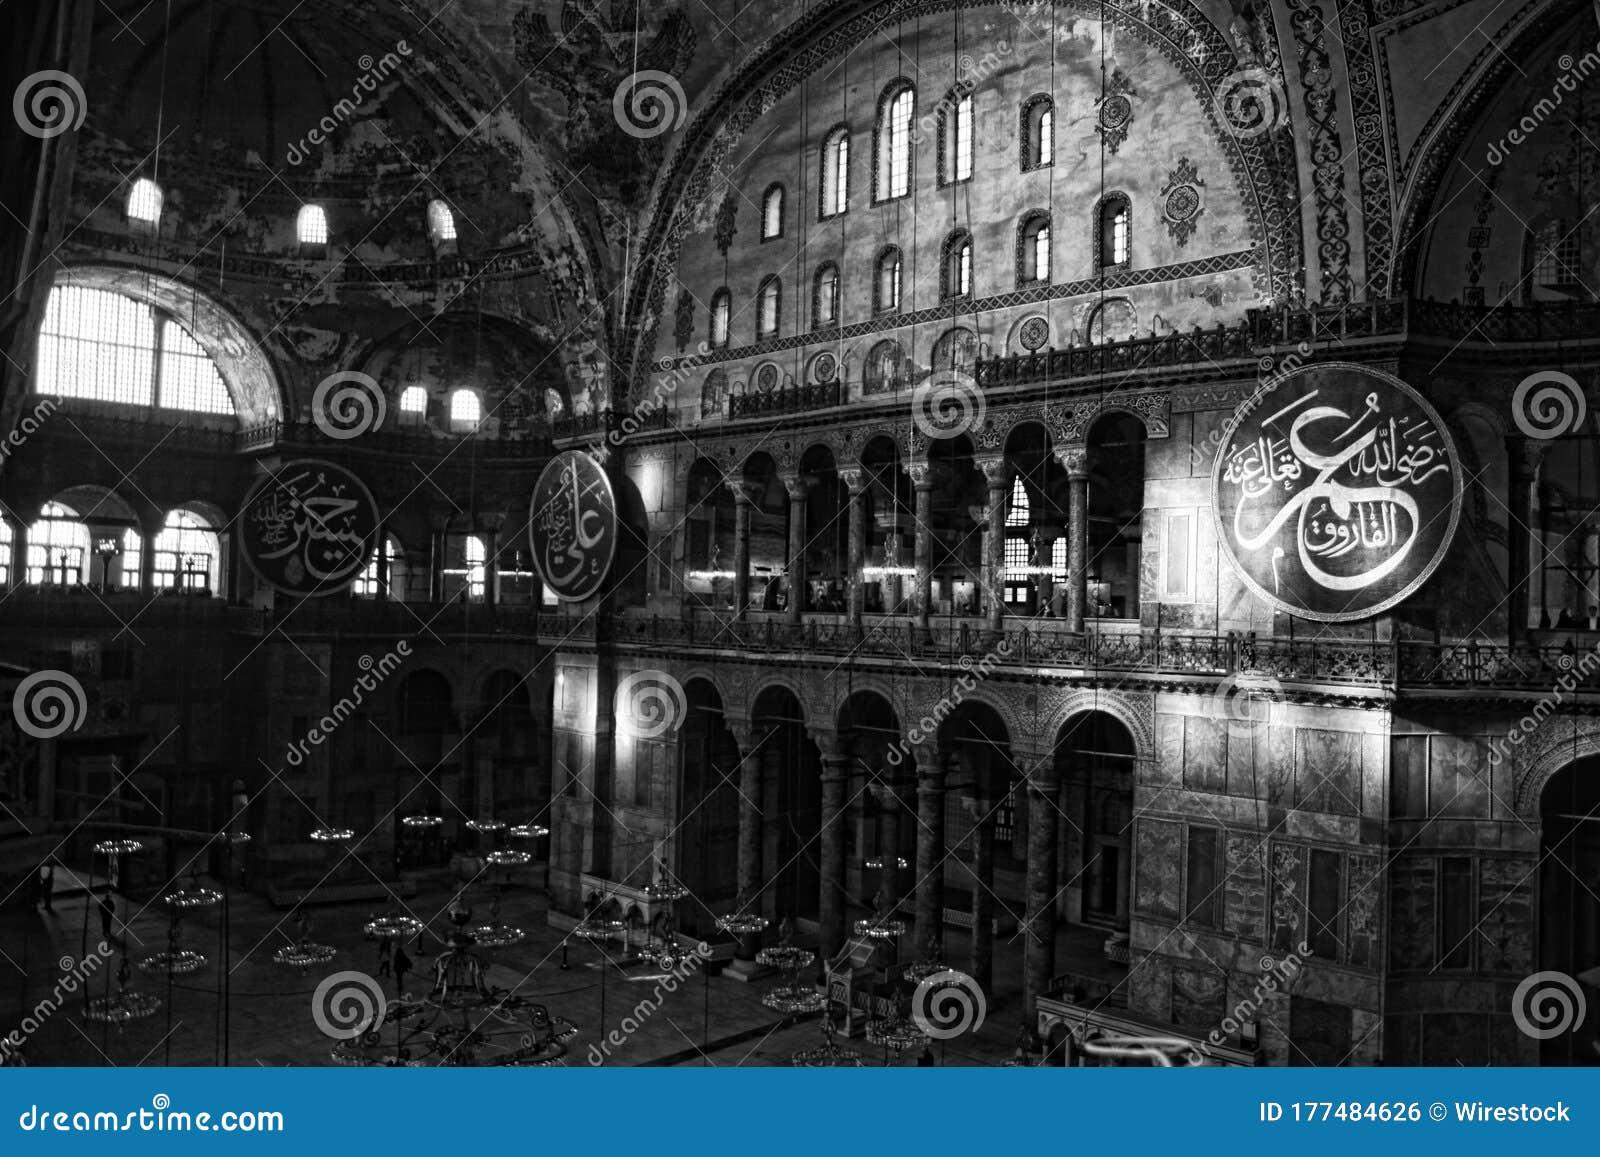 Greyscale Beautiful Shot Of Hagia Sophia S Interior In Istanbul Turkey Stock Photo Image Of Turkish Religion 177484626